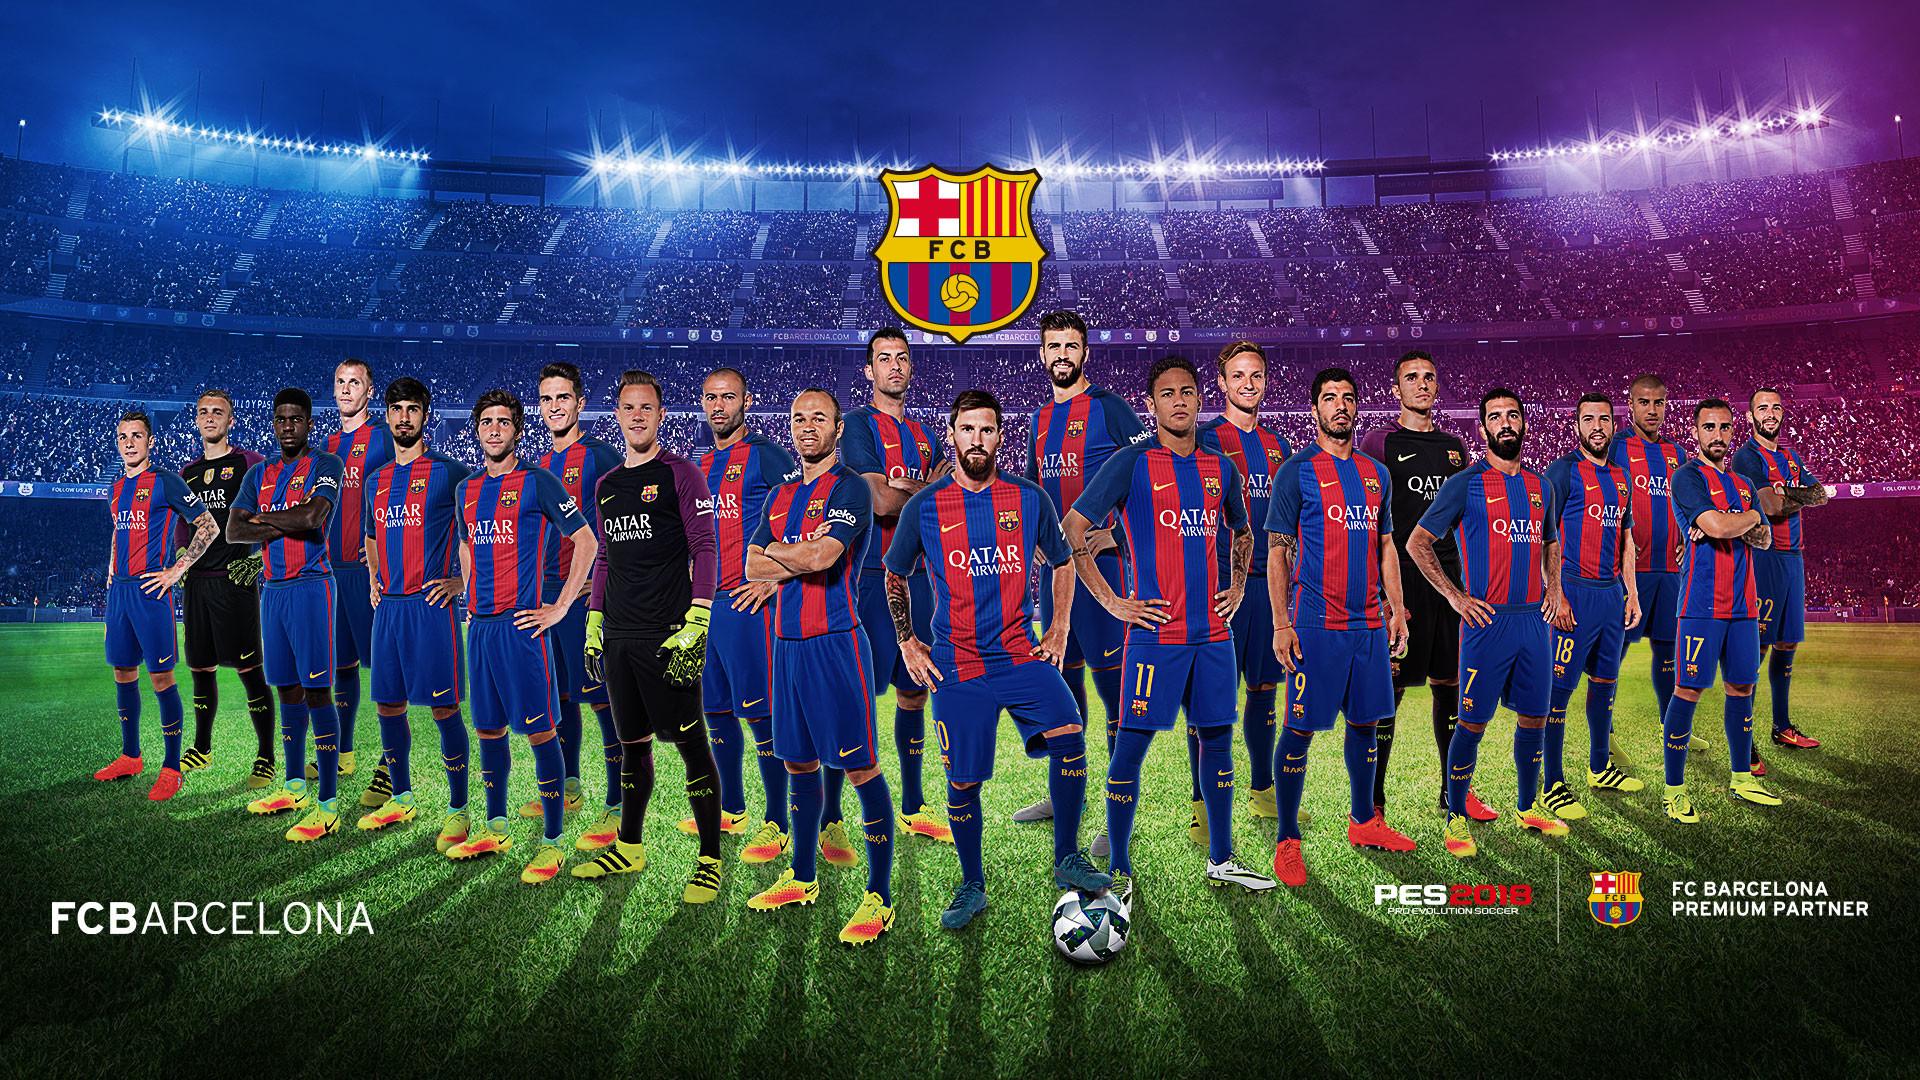 Fc barcelona logo 3